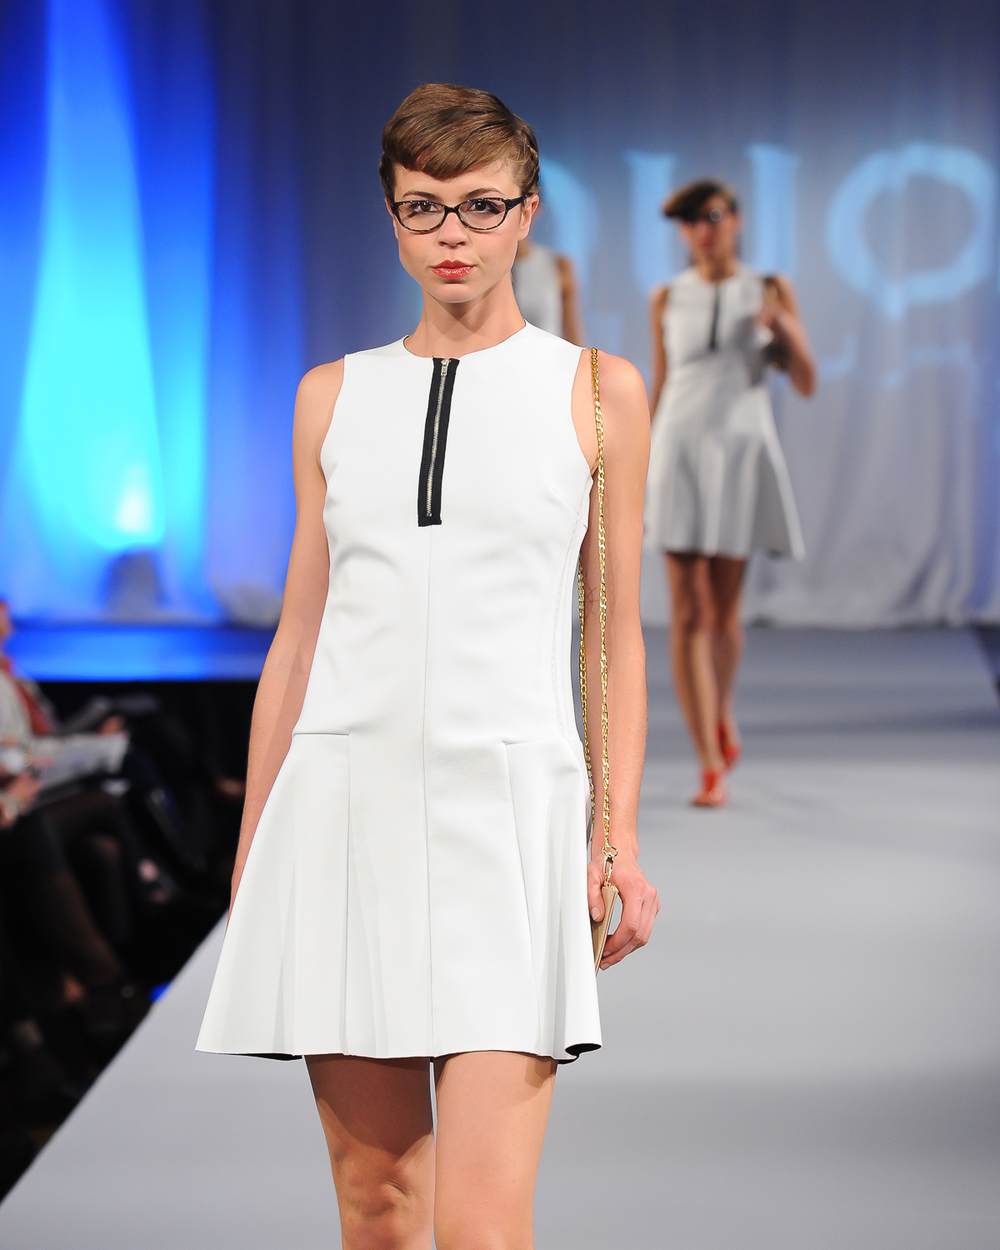 bristol-fashion-photographer-9.jpg